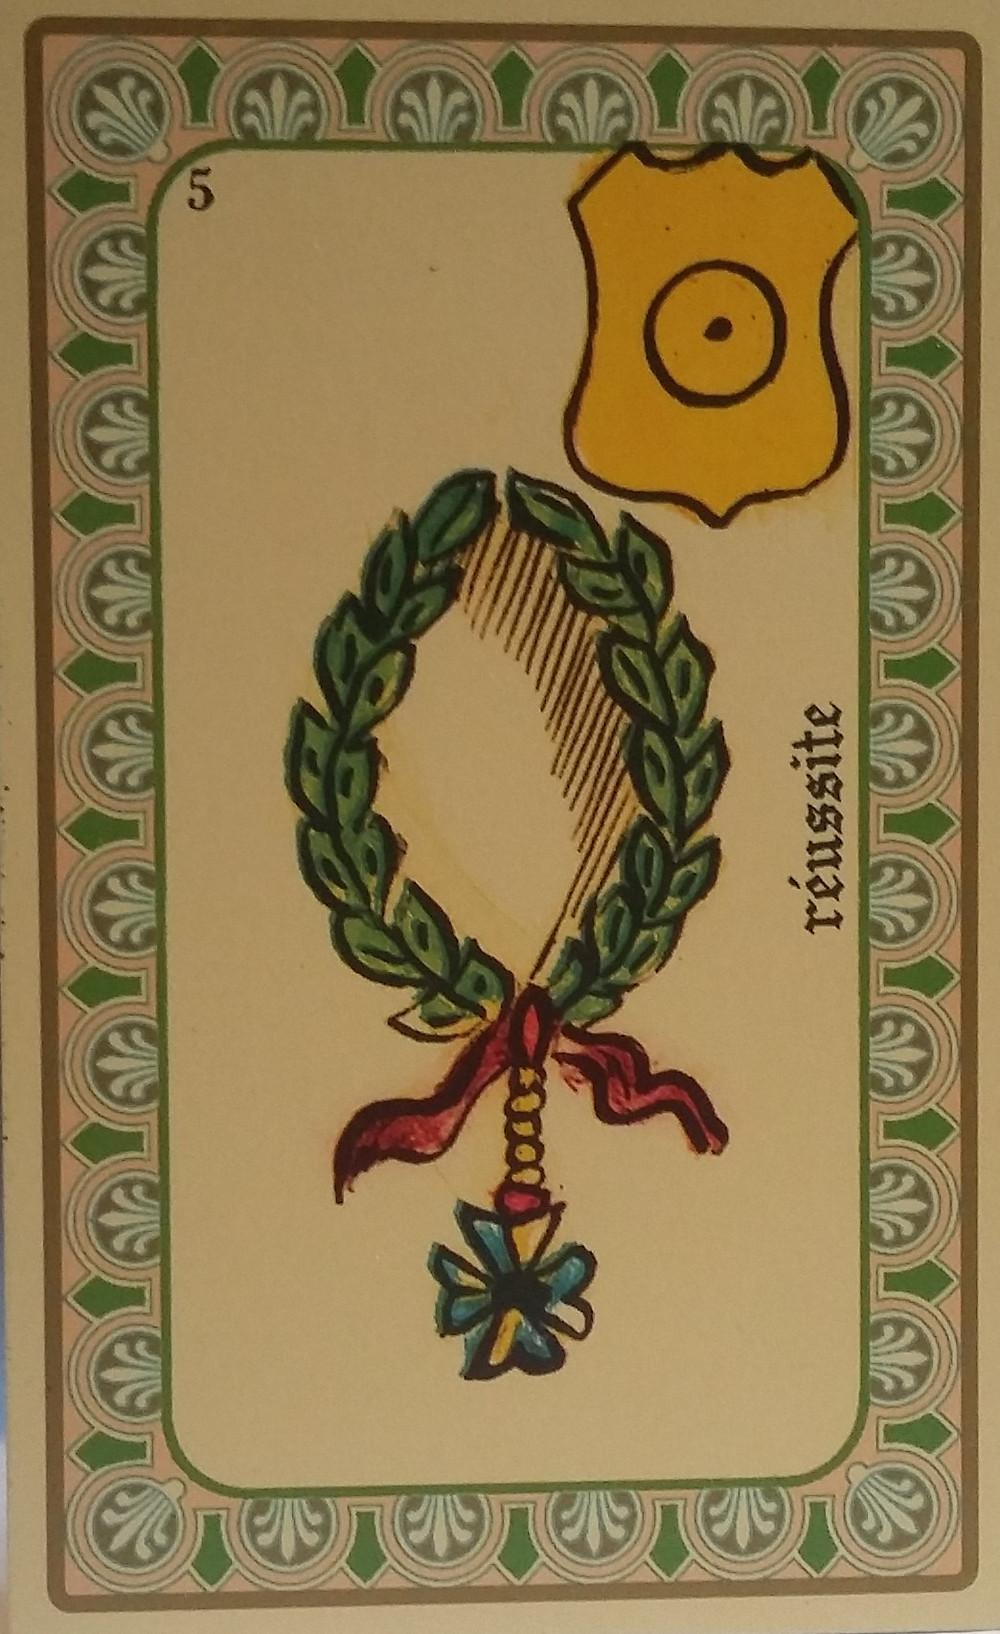 Oracle de Belline carte 5 la réussite